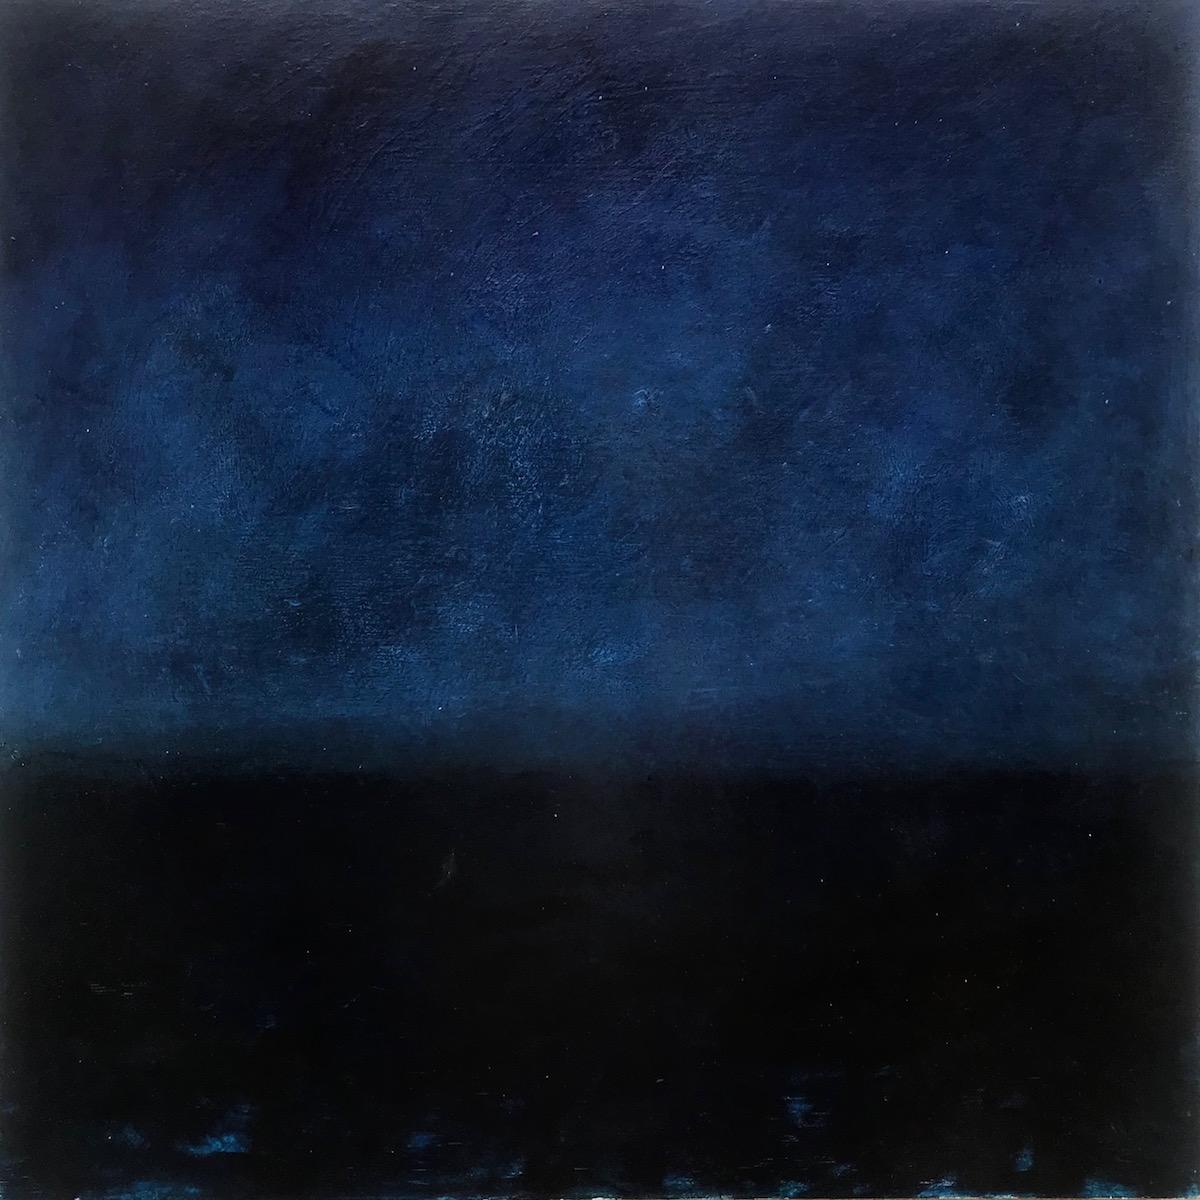 """Sea and Sky at Night"" KristaMachovina"